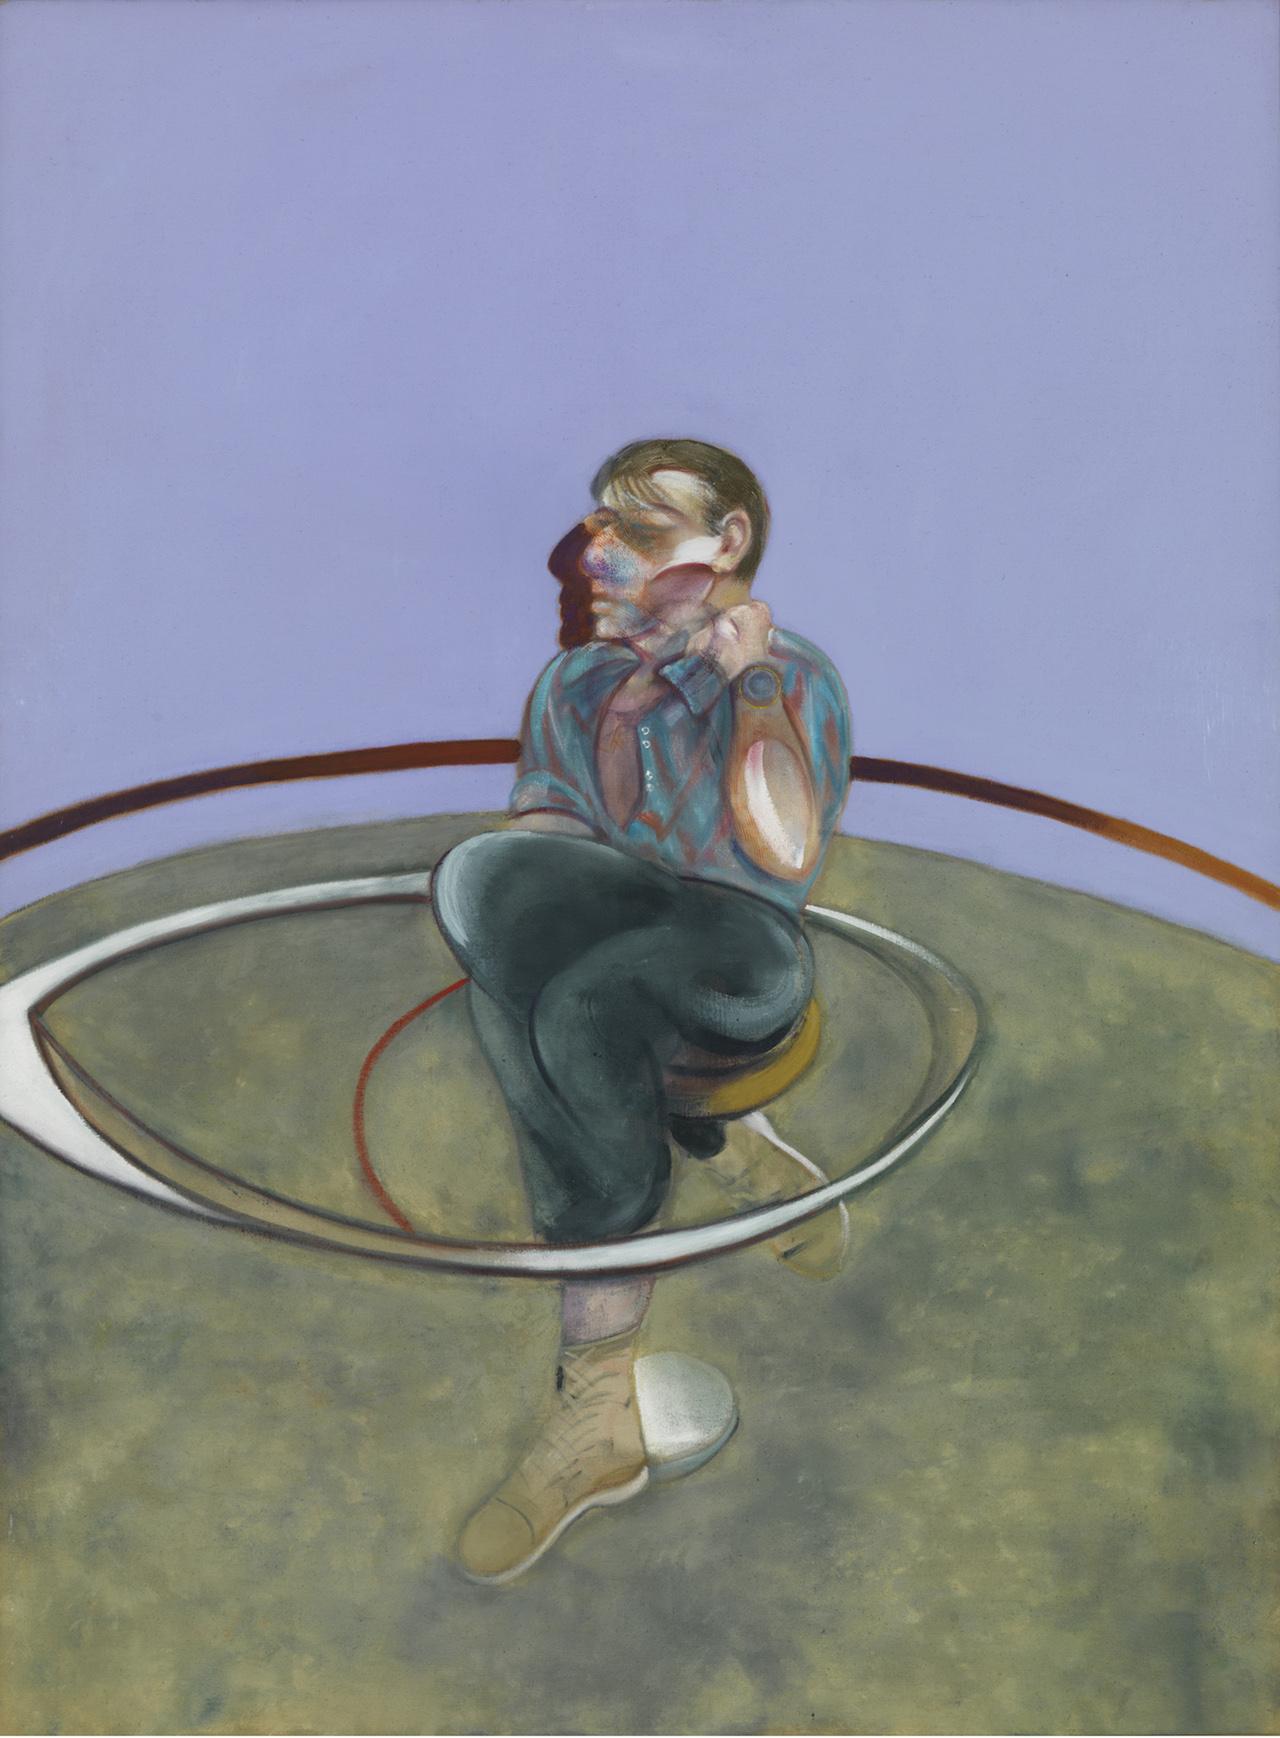 4_BACON 1978.0004 Self-Portrait